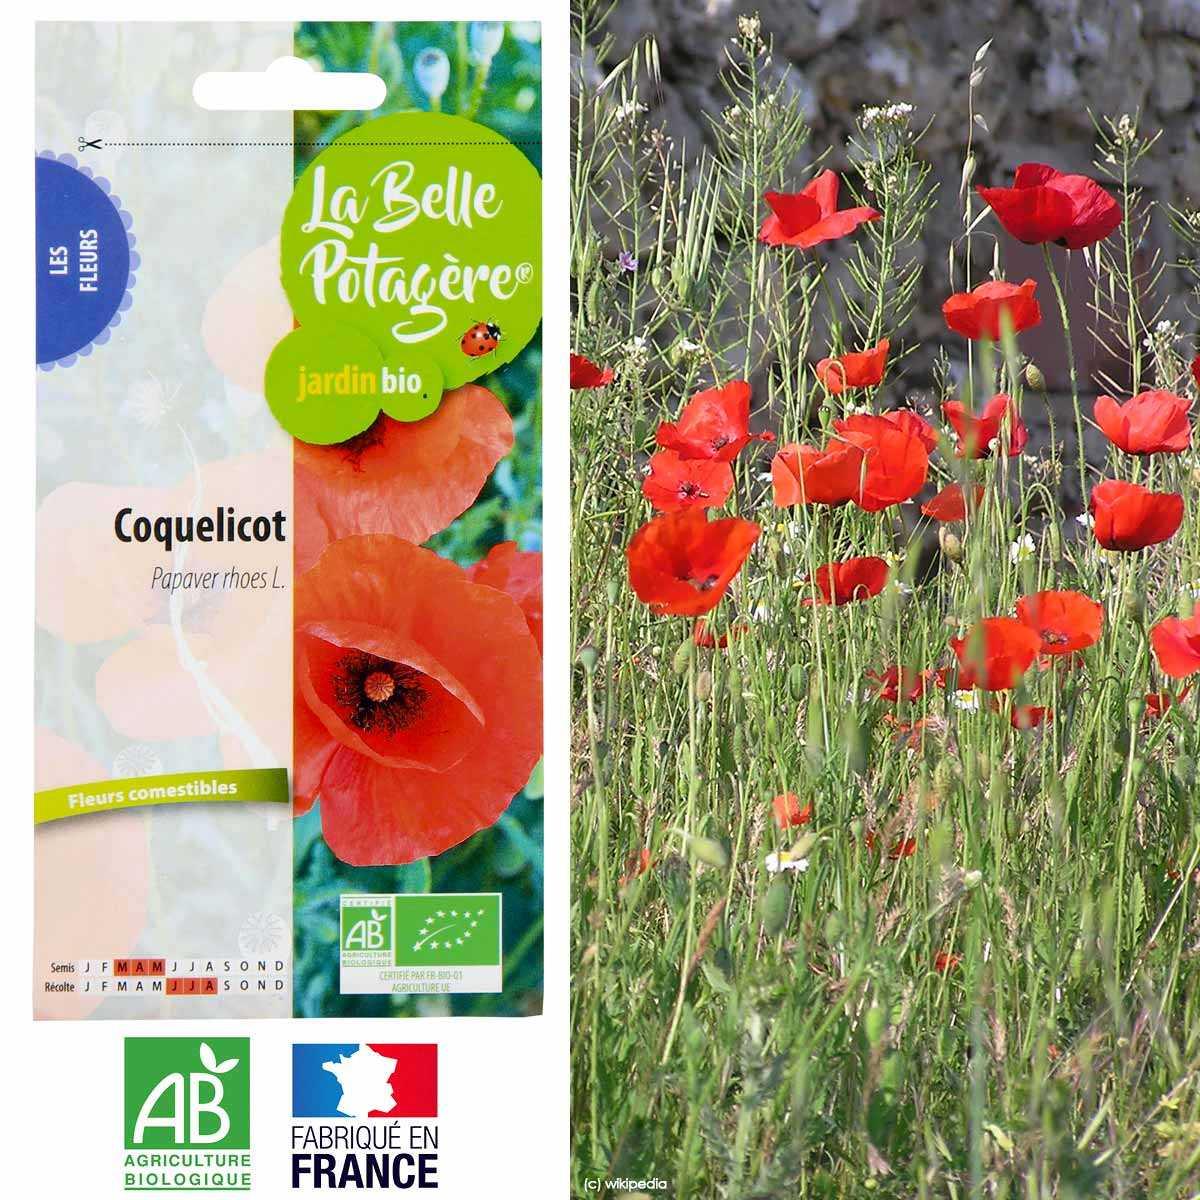 Planter Des Coquelicots Dans Son Jardin graines de coquelicot sauvage bio